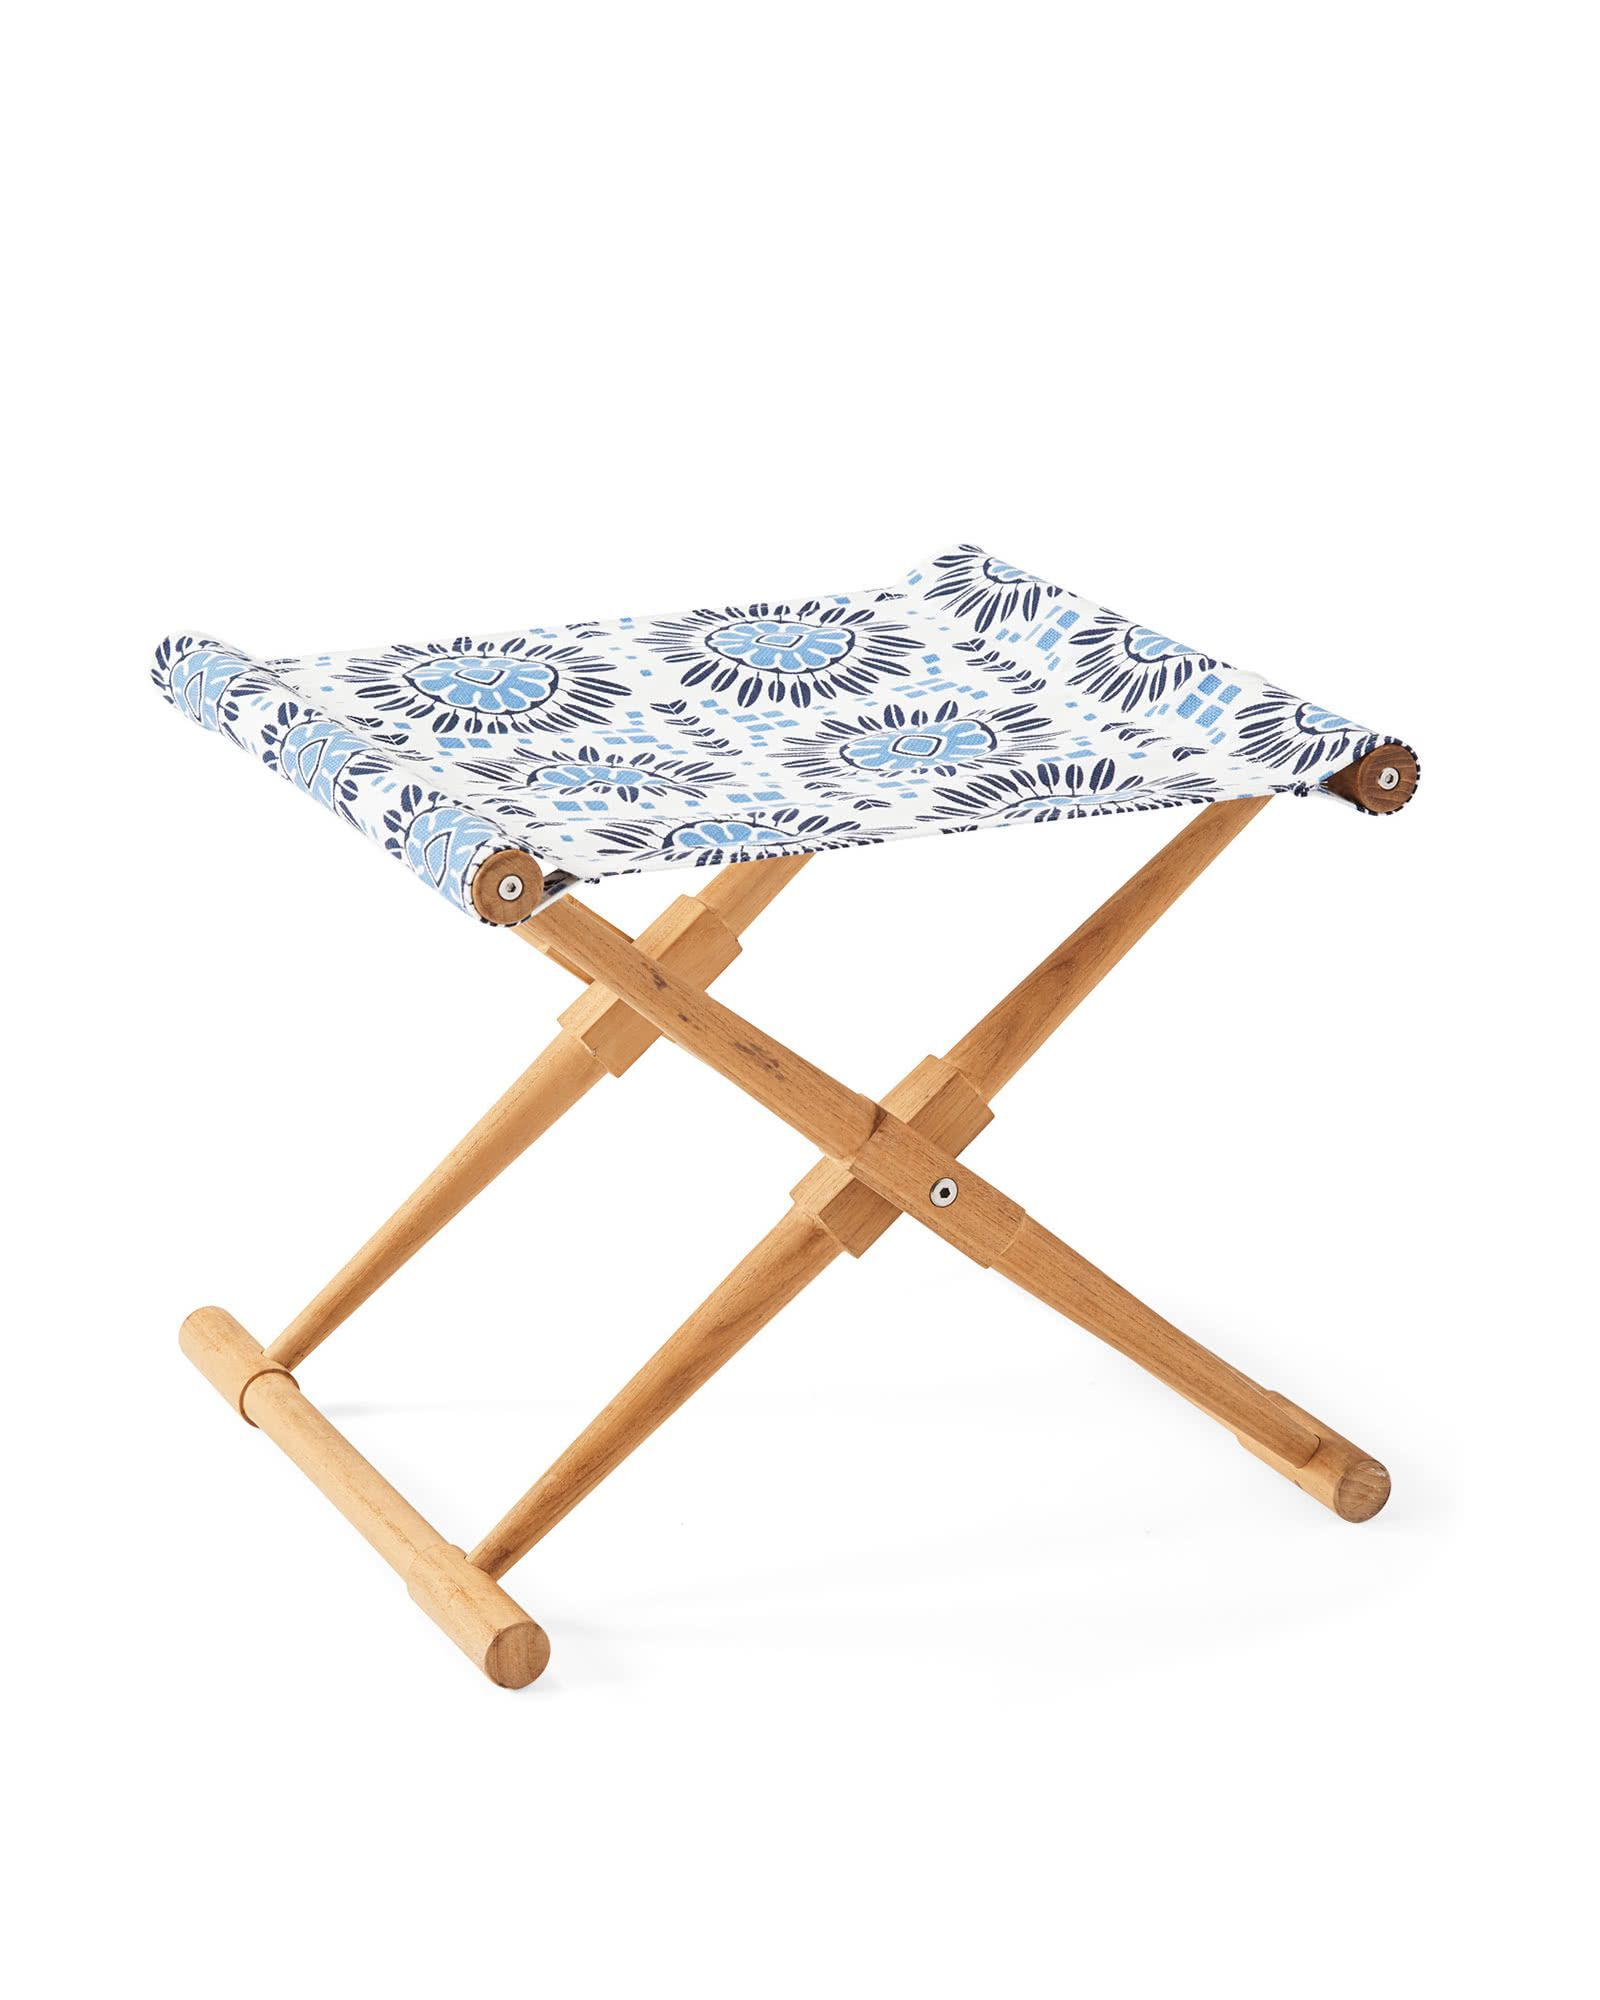 Magnificent Teak Camp Stool Uwap Interior Chair Design Uwaporg